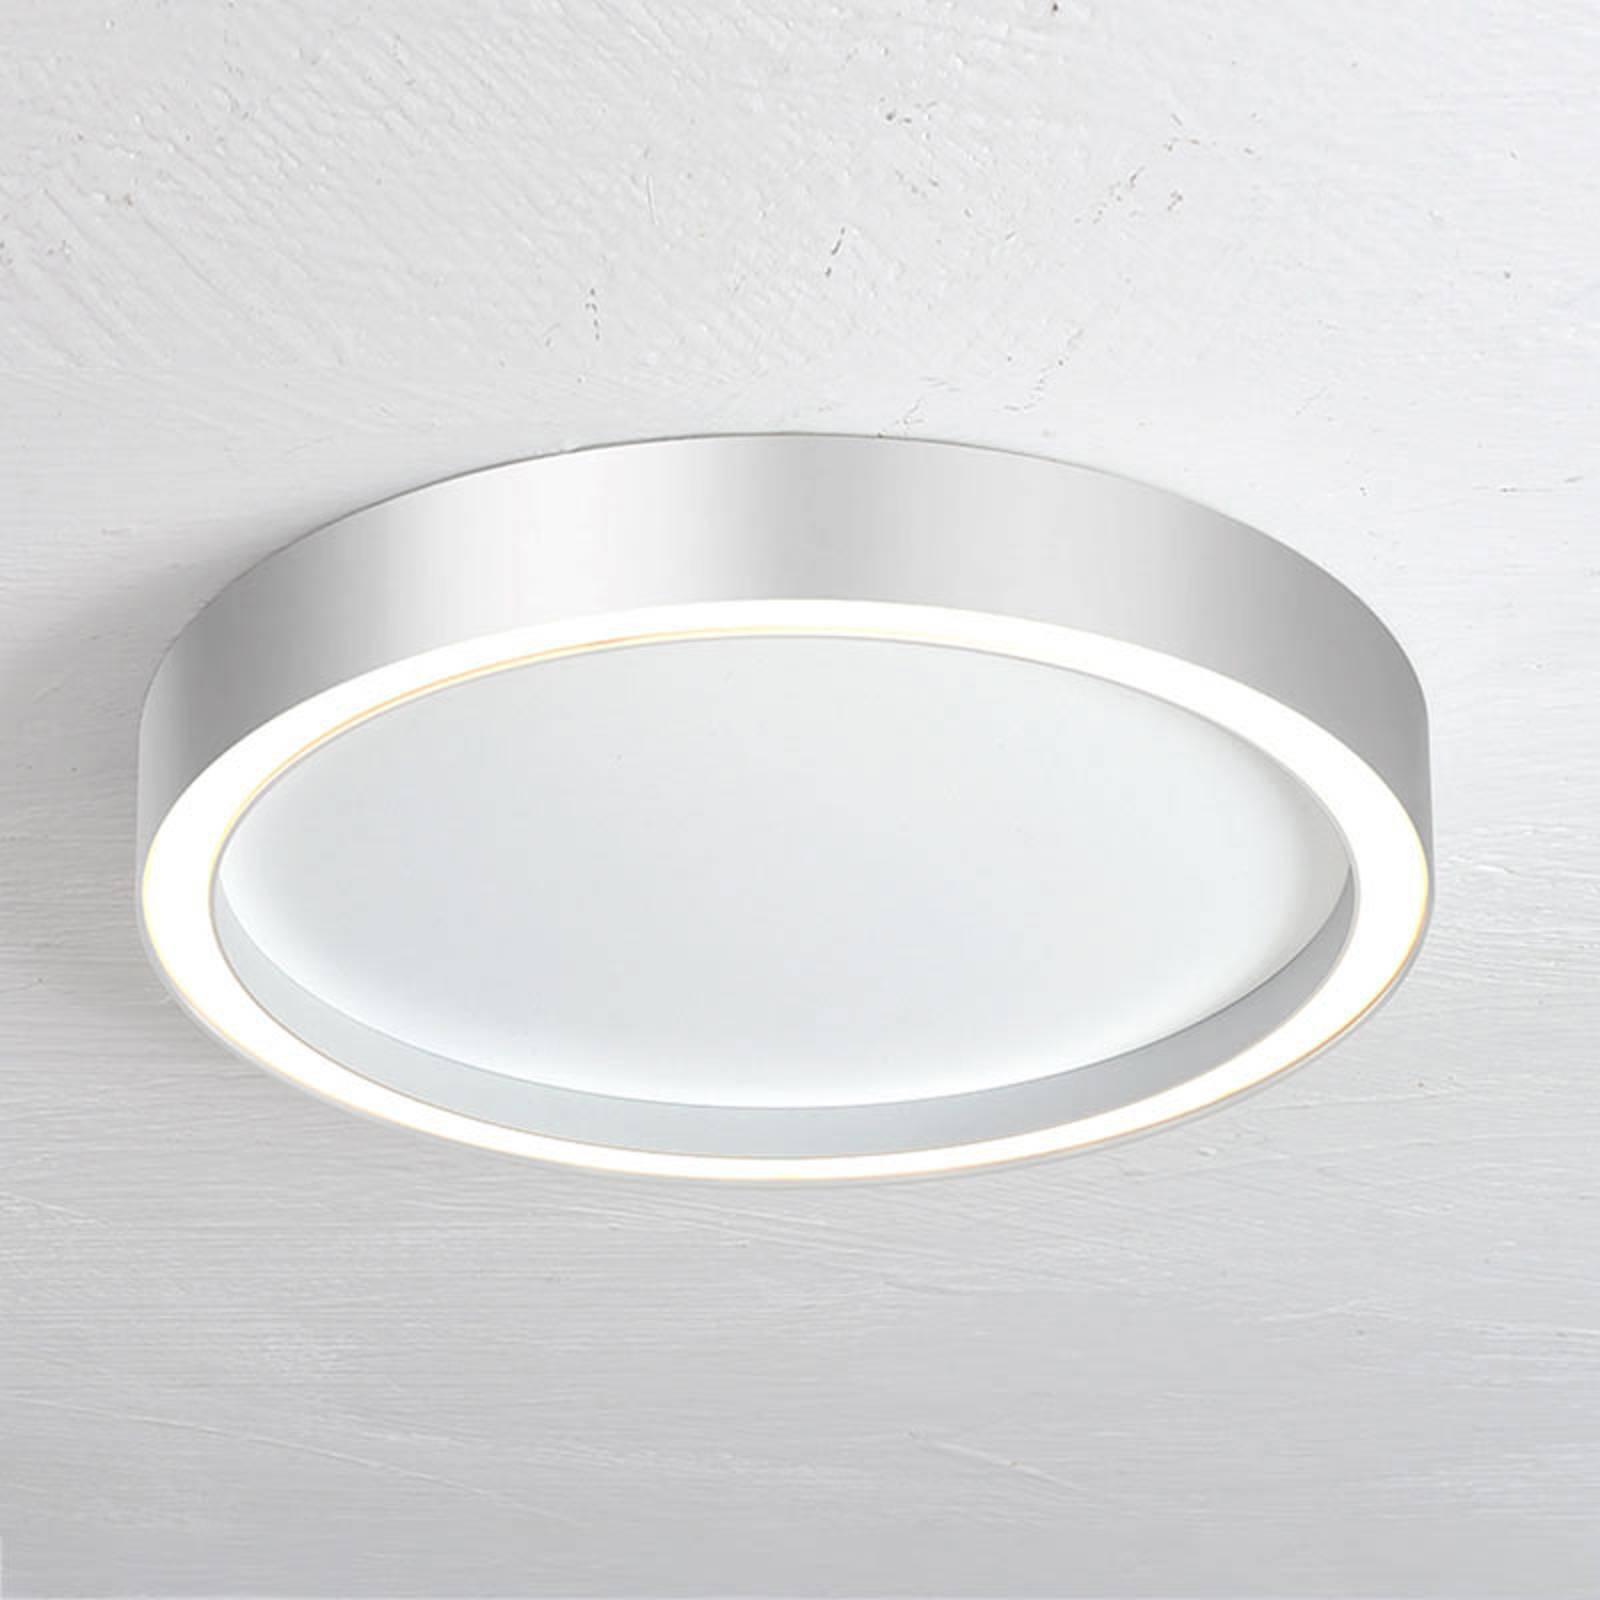 Bopp Aura LED-Deckenleuchte Ø 55cm weiß/aluminium